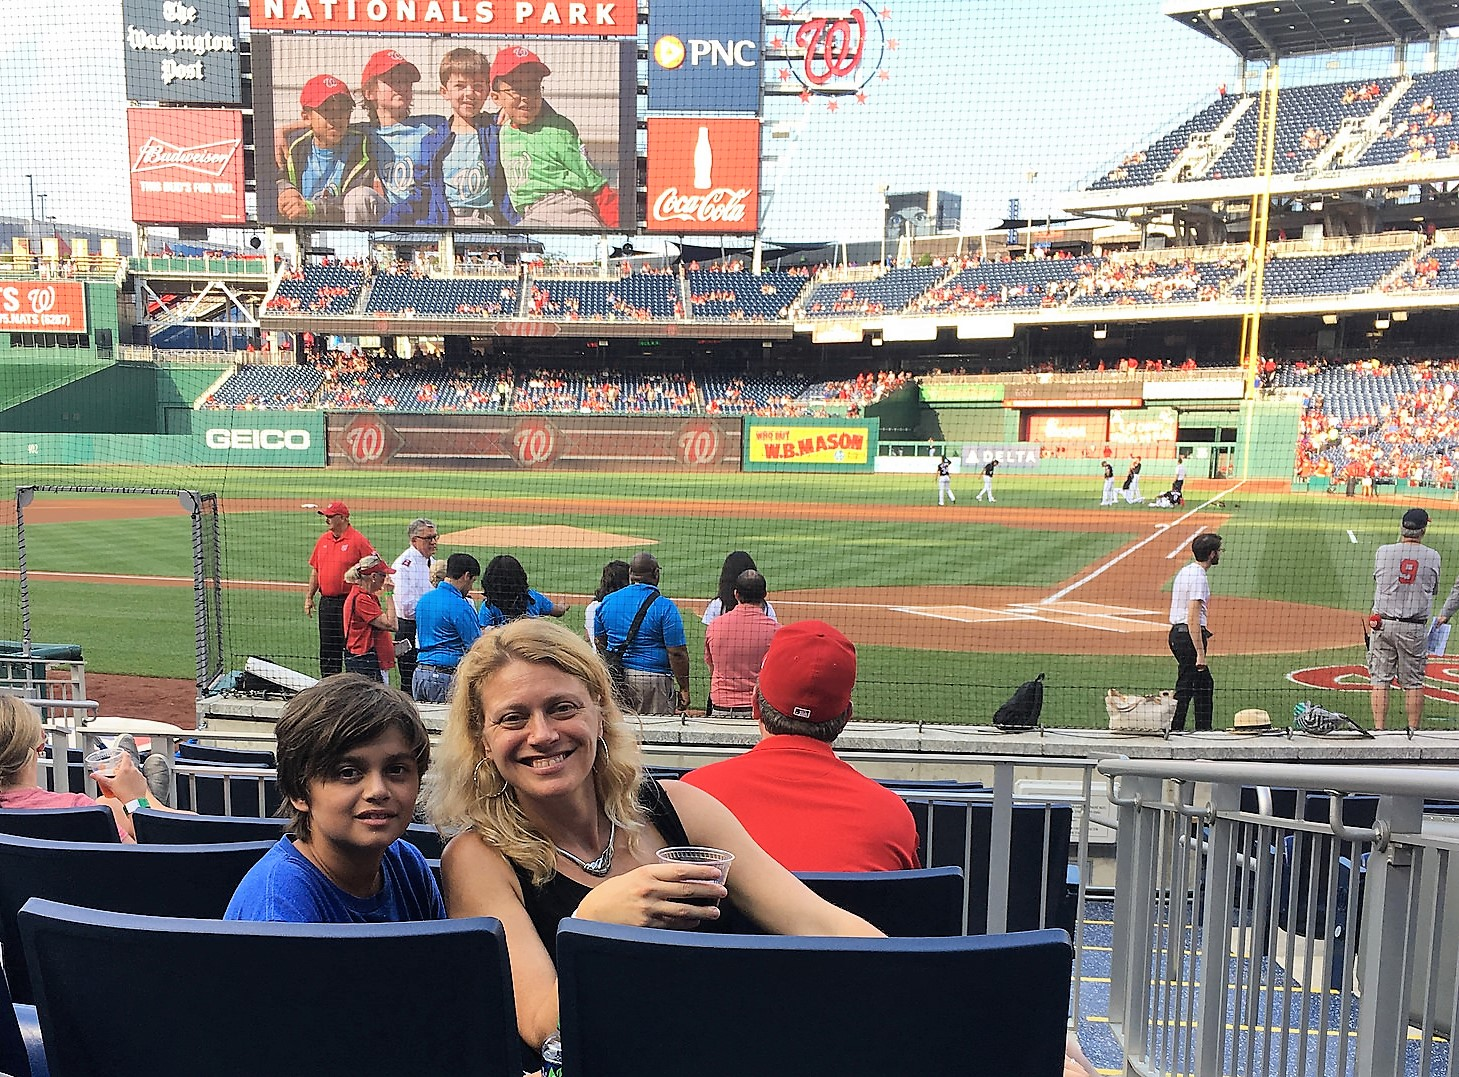 washington nationals baseball game - mother and son time